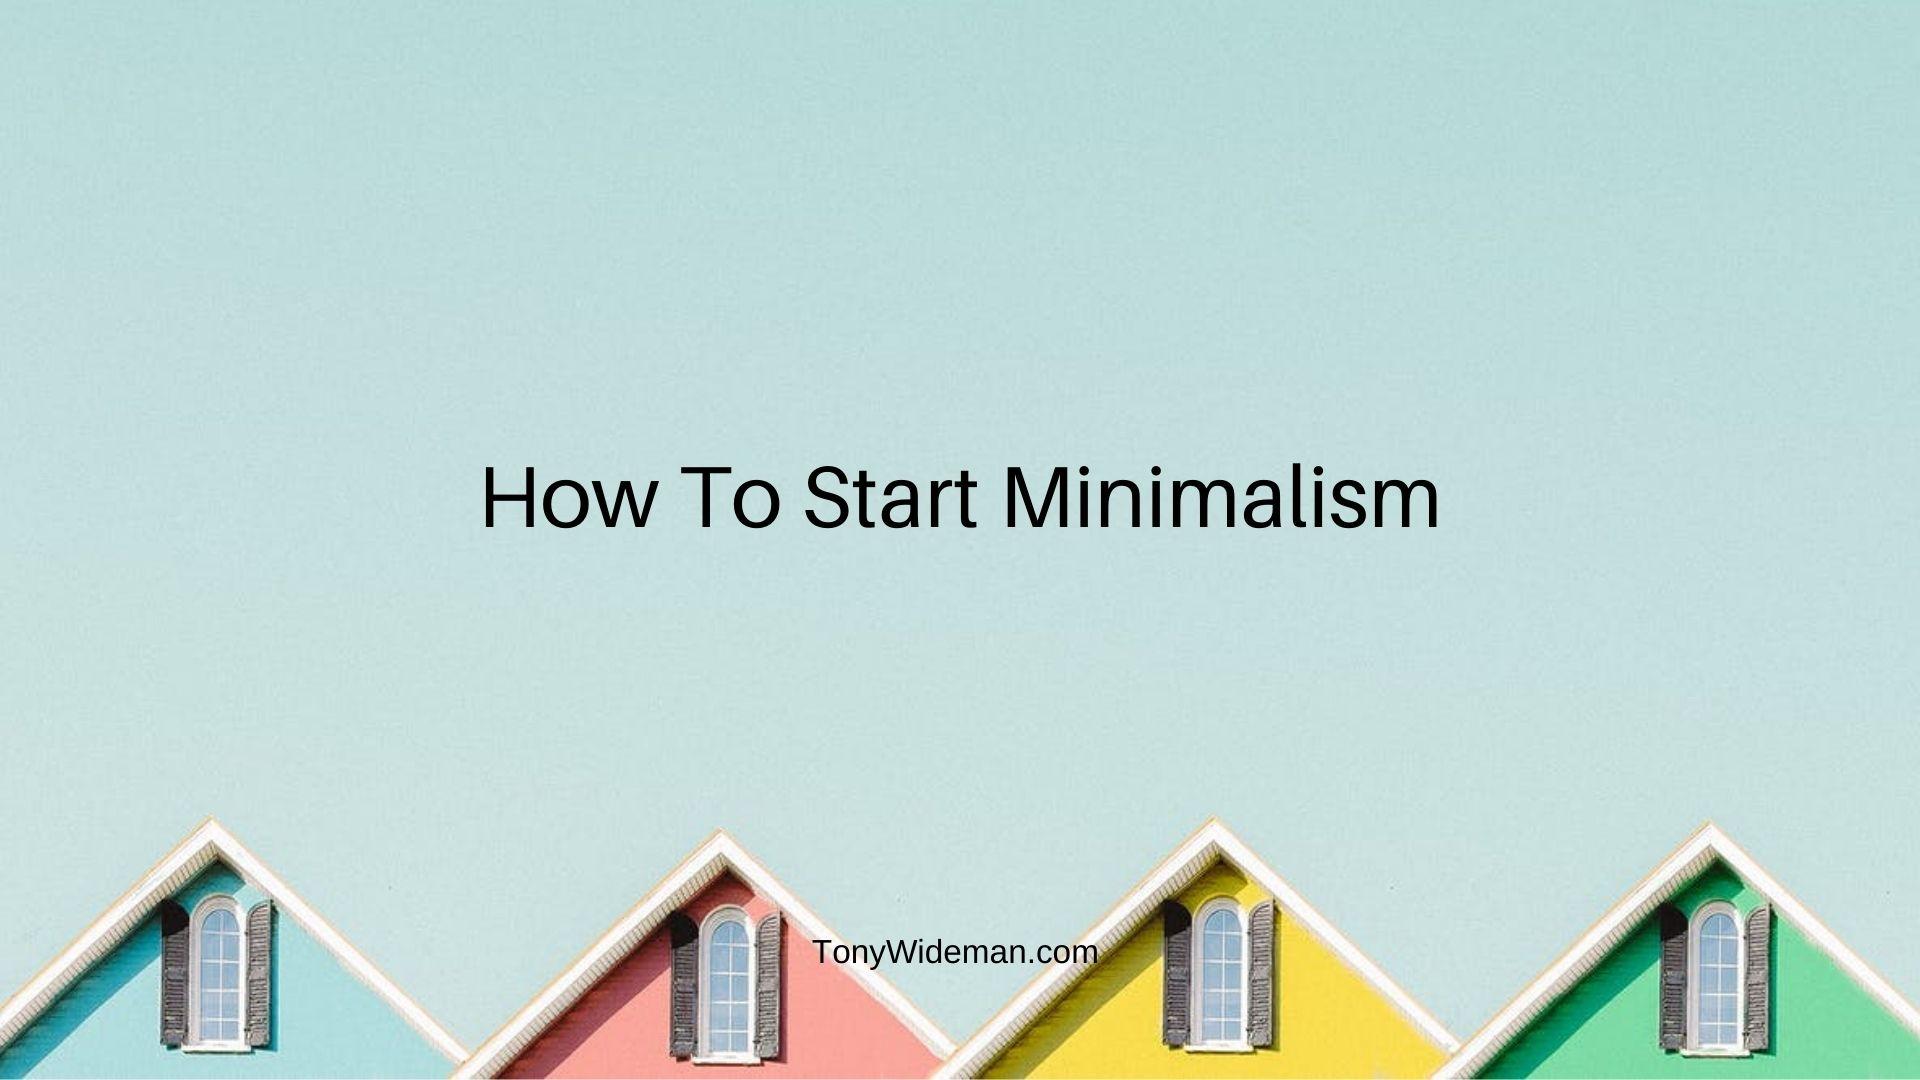 How To Start Minimalism